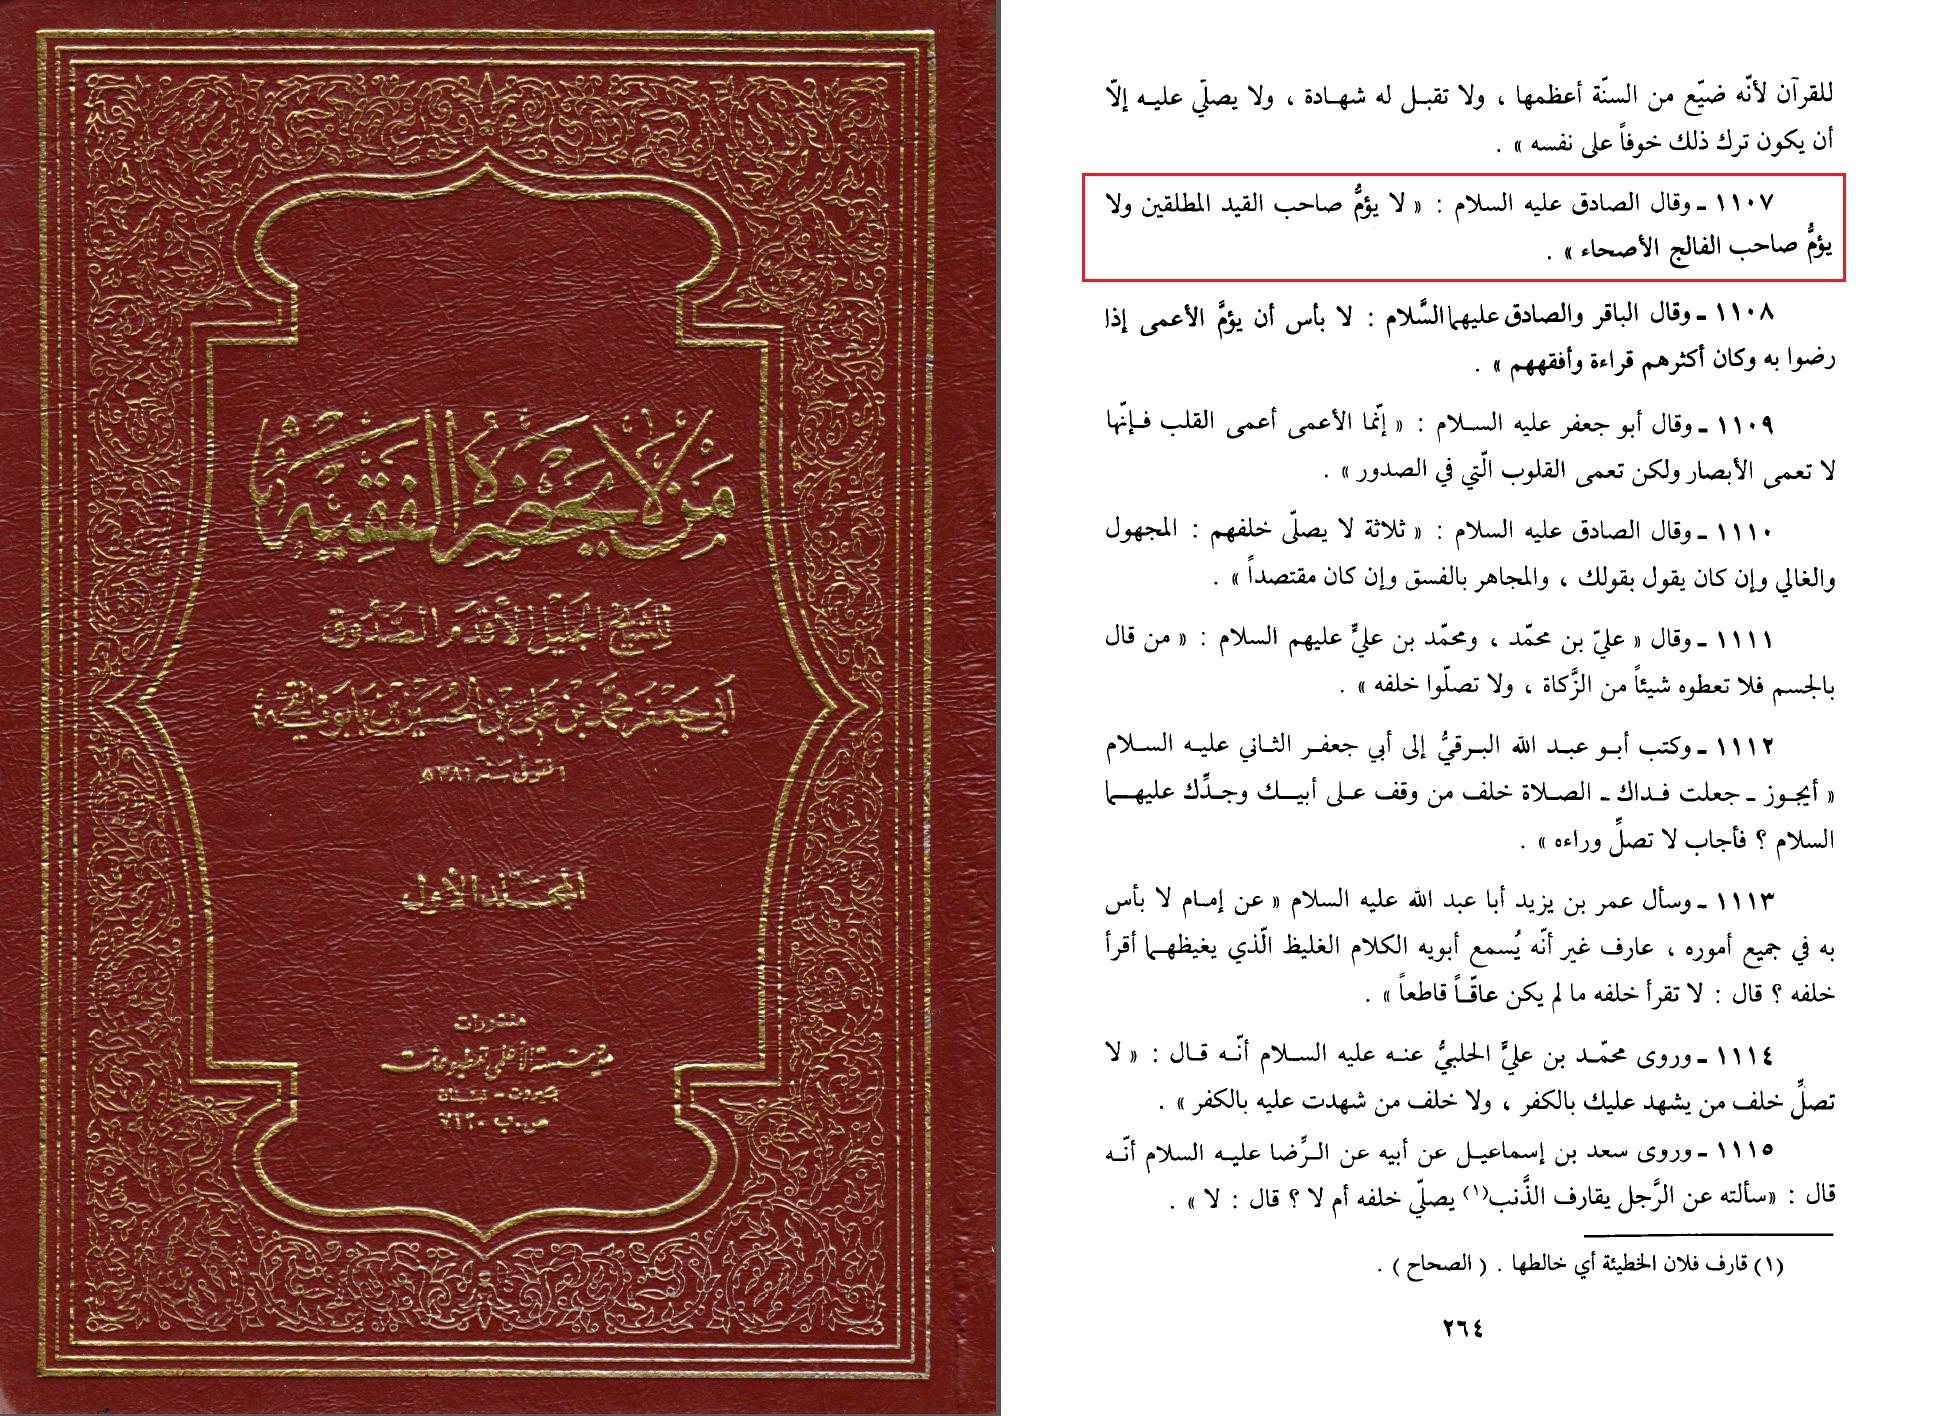 Faqih-e Saduq B 1 S 264 H 1107